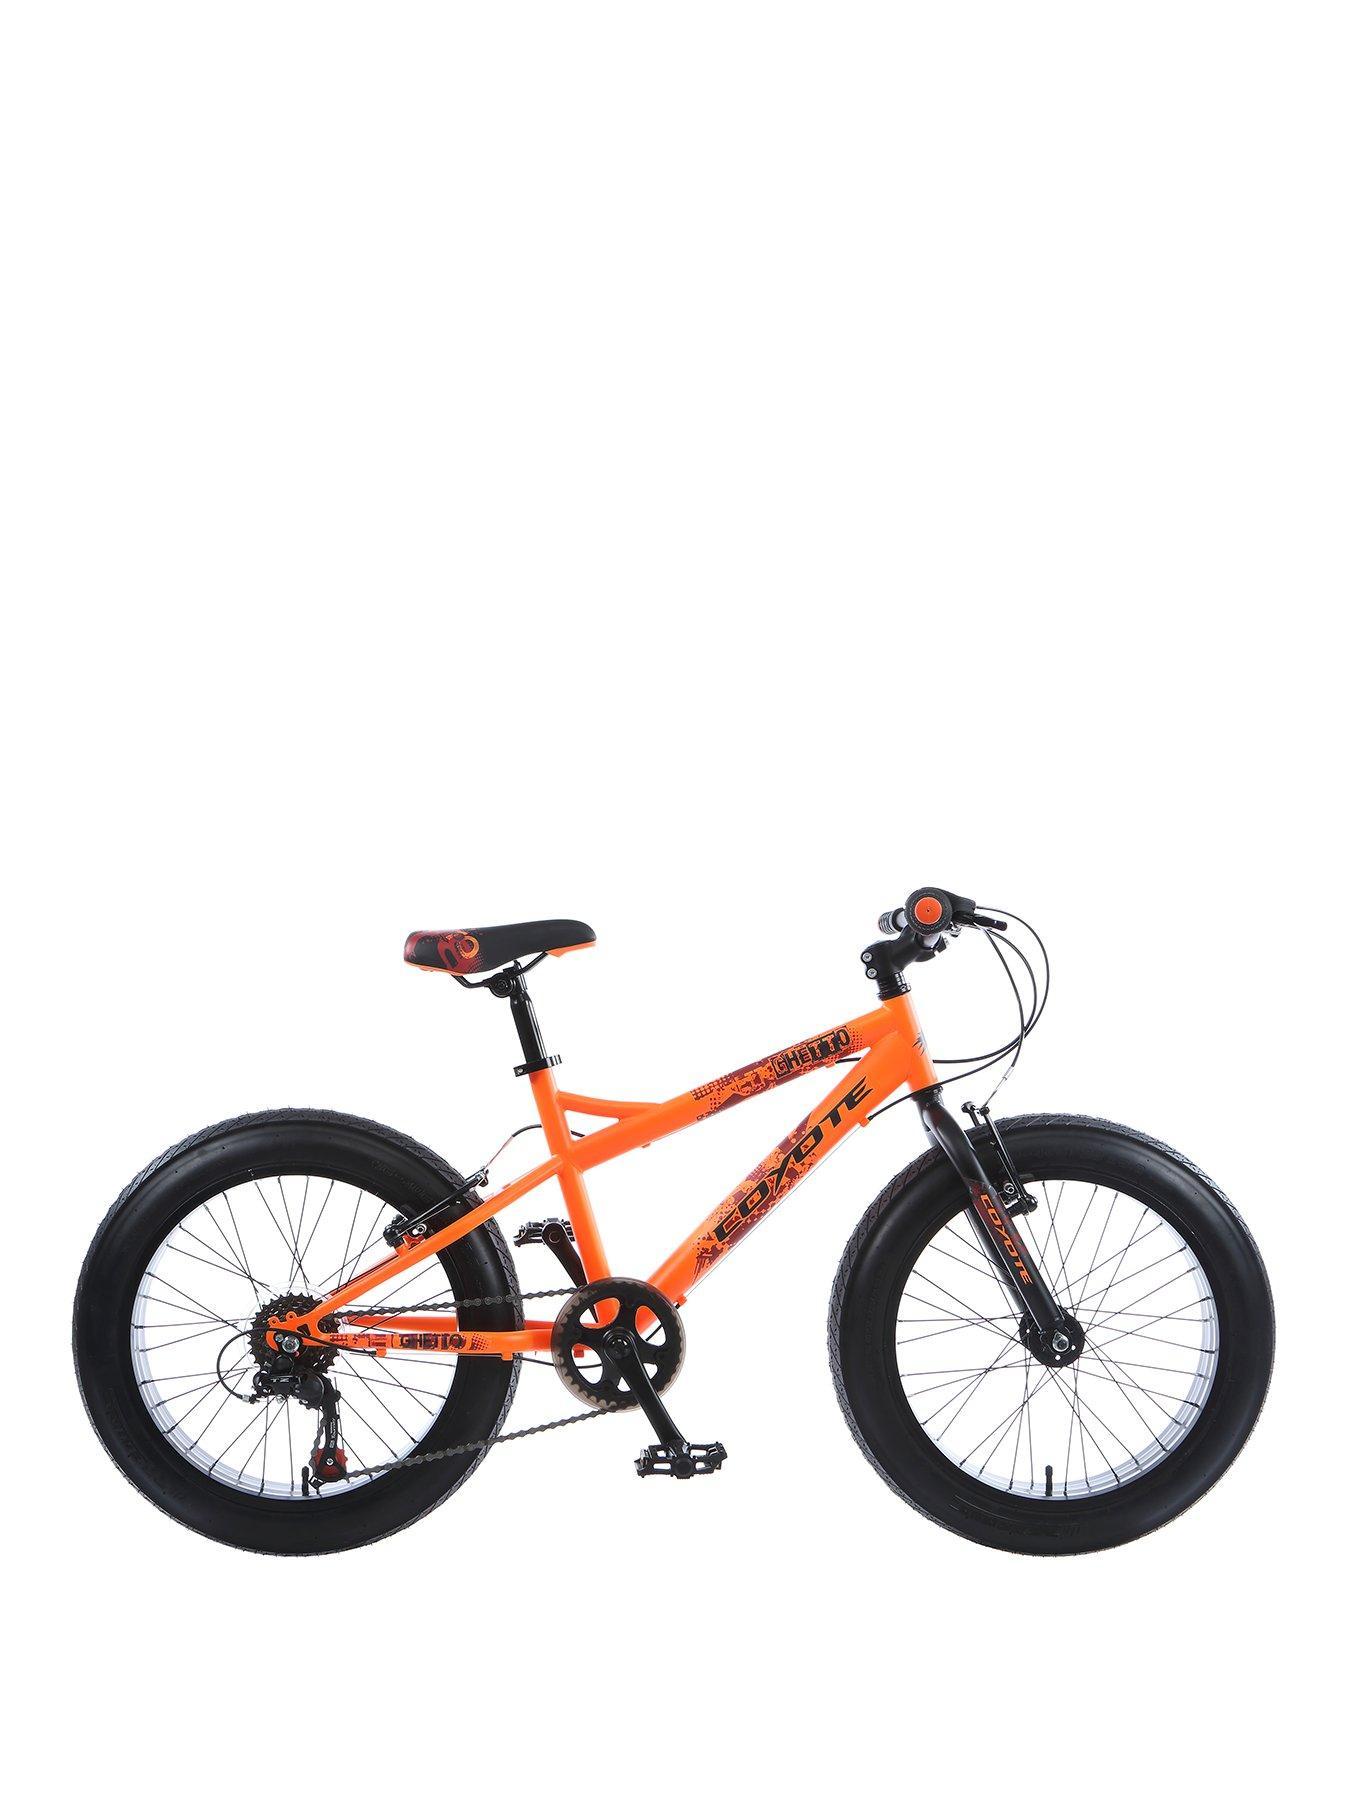 Compare prices for Coyote Ghetto Fat Tyre Boys Bike 20 inch Wheel